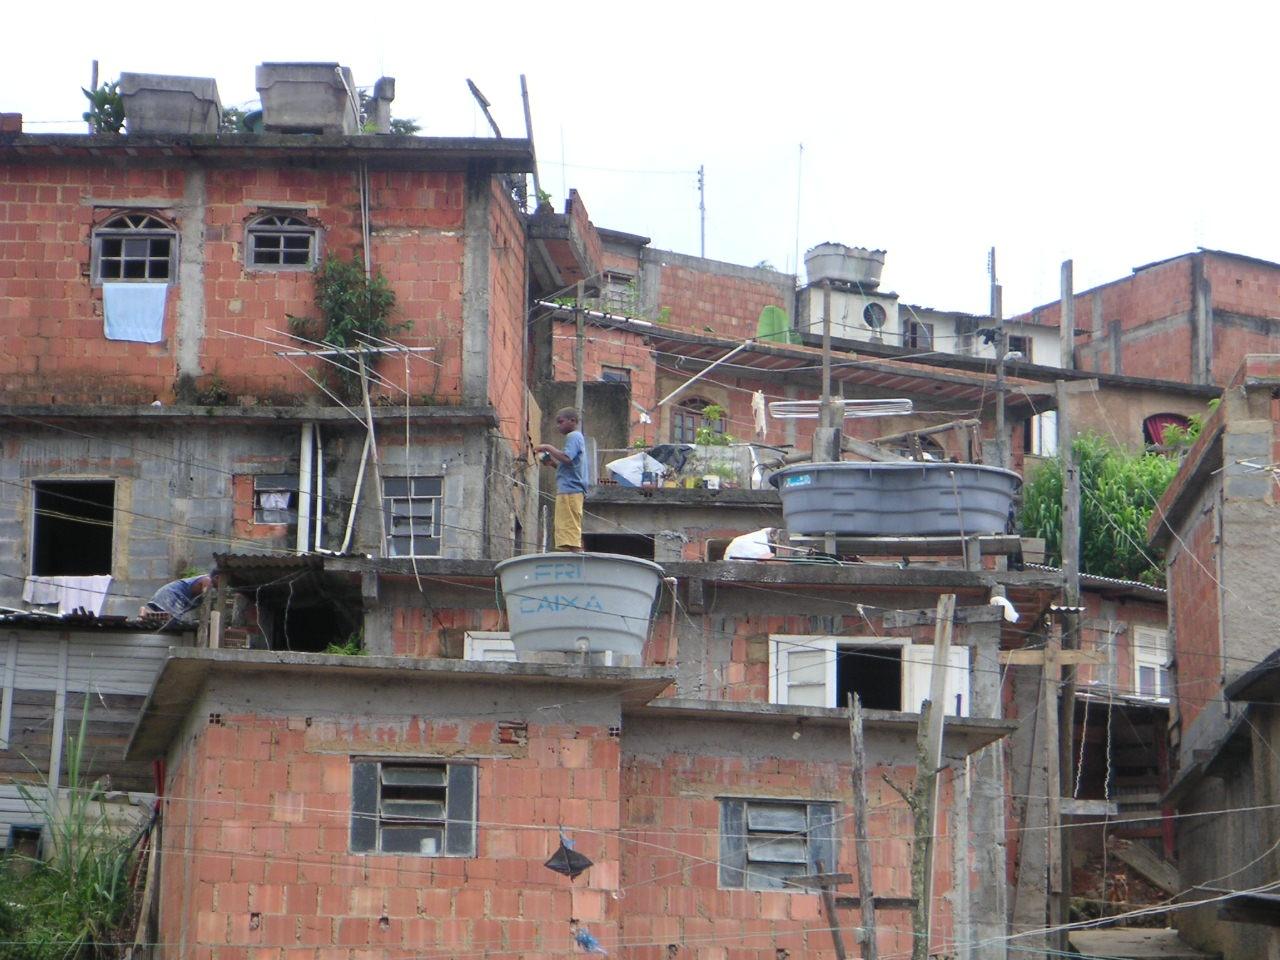 cufa balsas ma 04 de novembro dia da favela. Black Bedroom Furniture Sets. Home Design Ideas